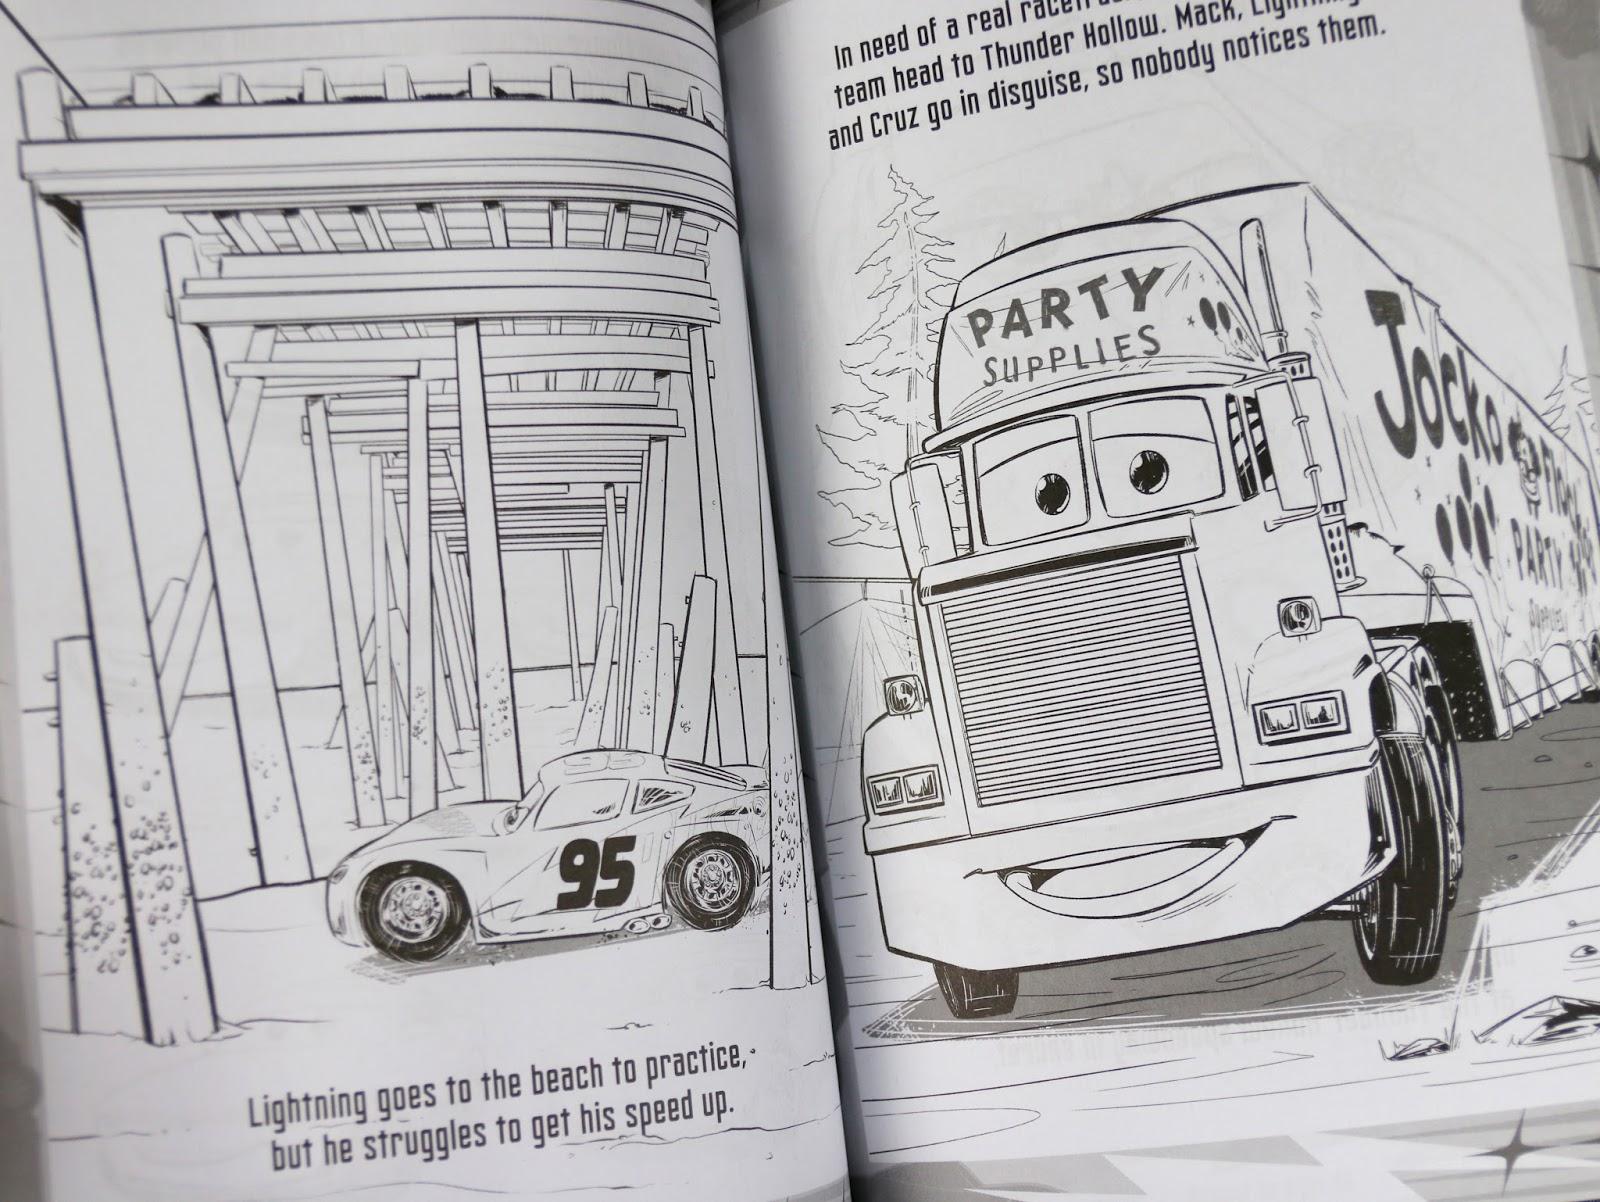 pixar cars 3 REV IT UP! COLOR ACTIVITY BOOK